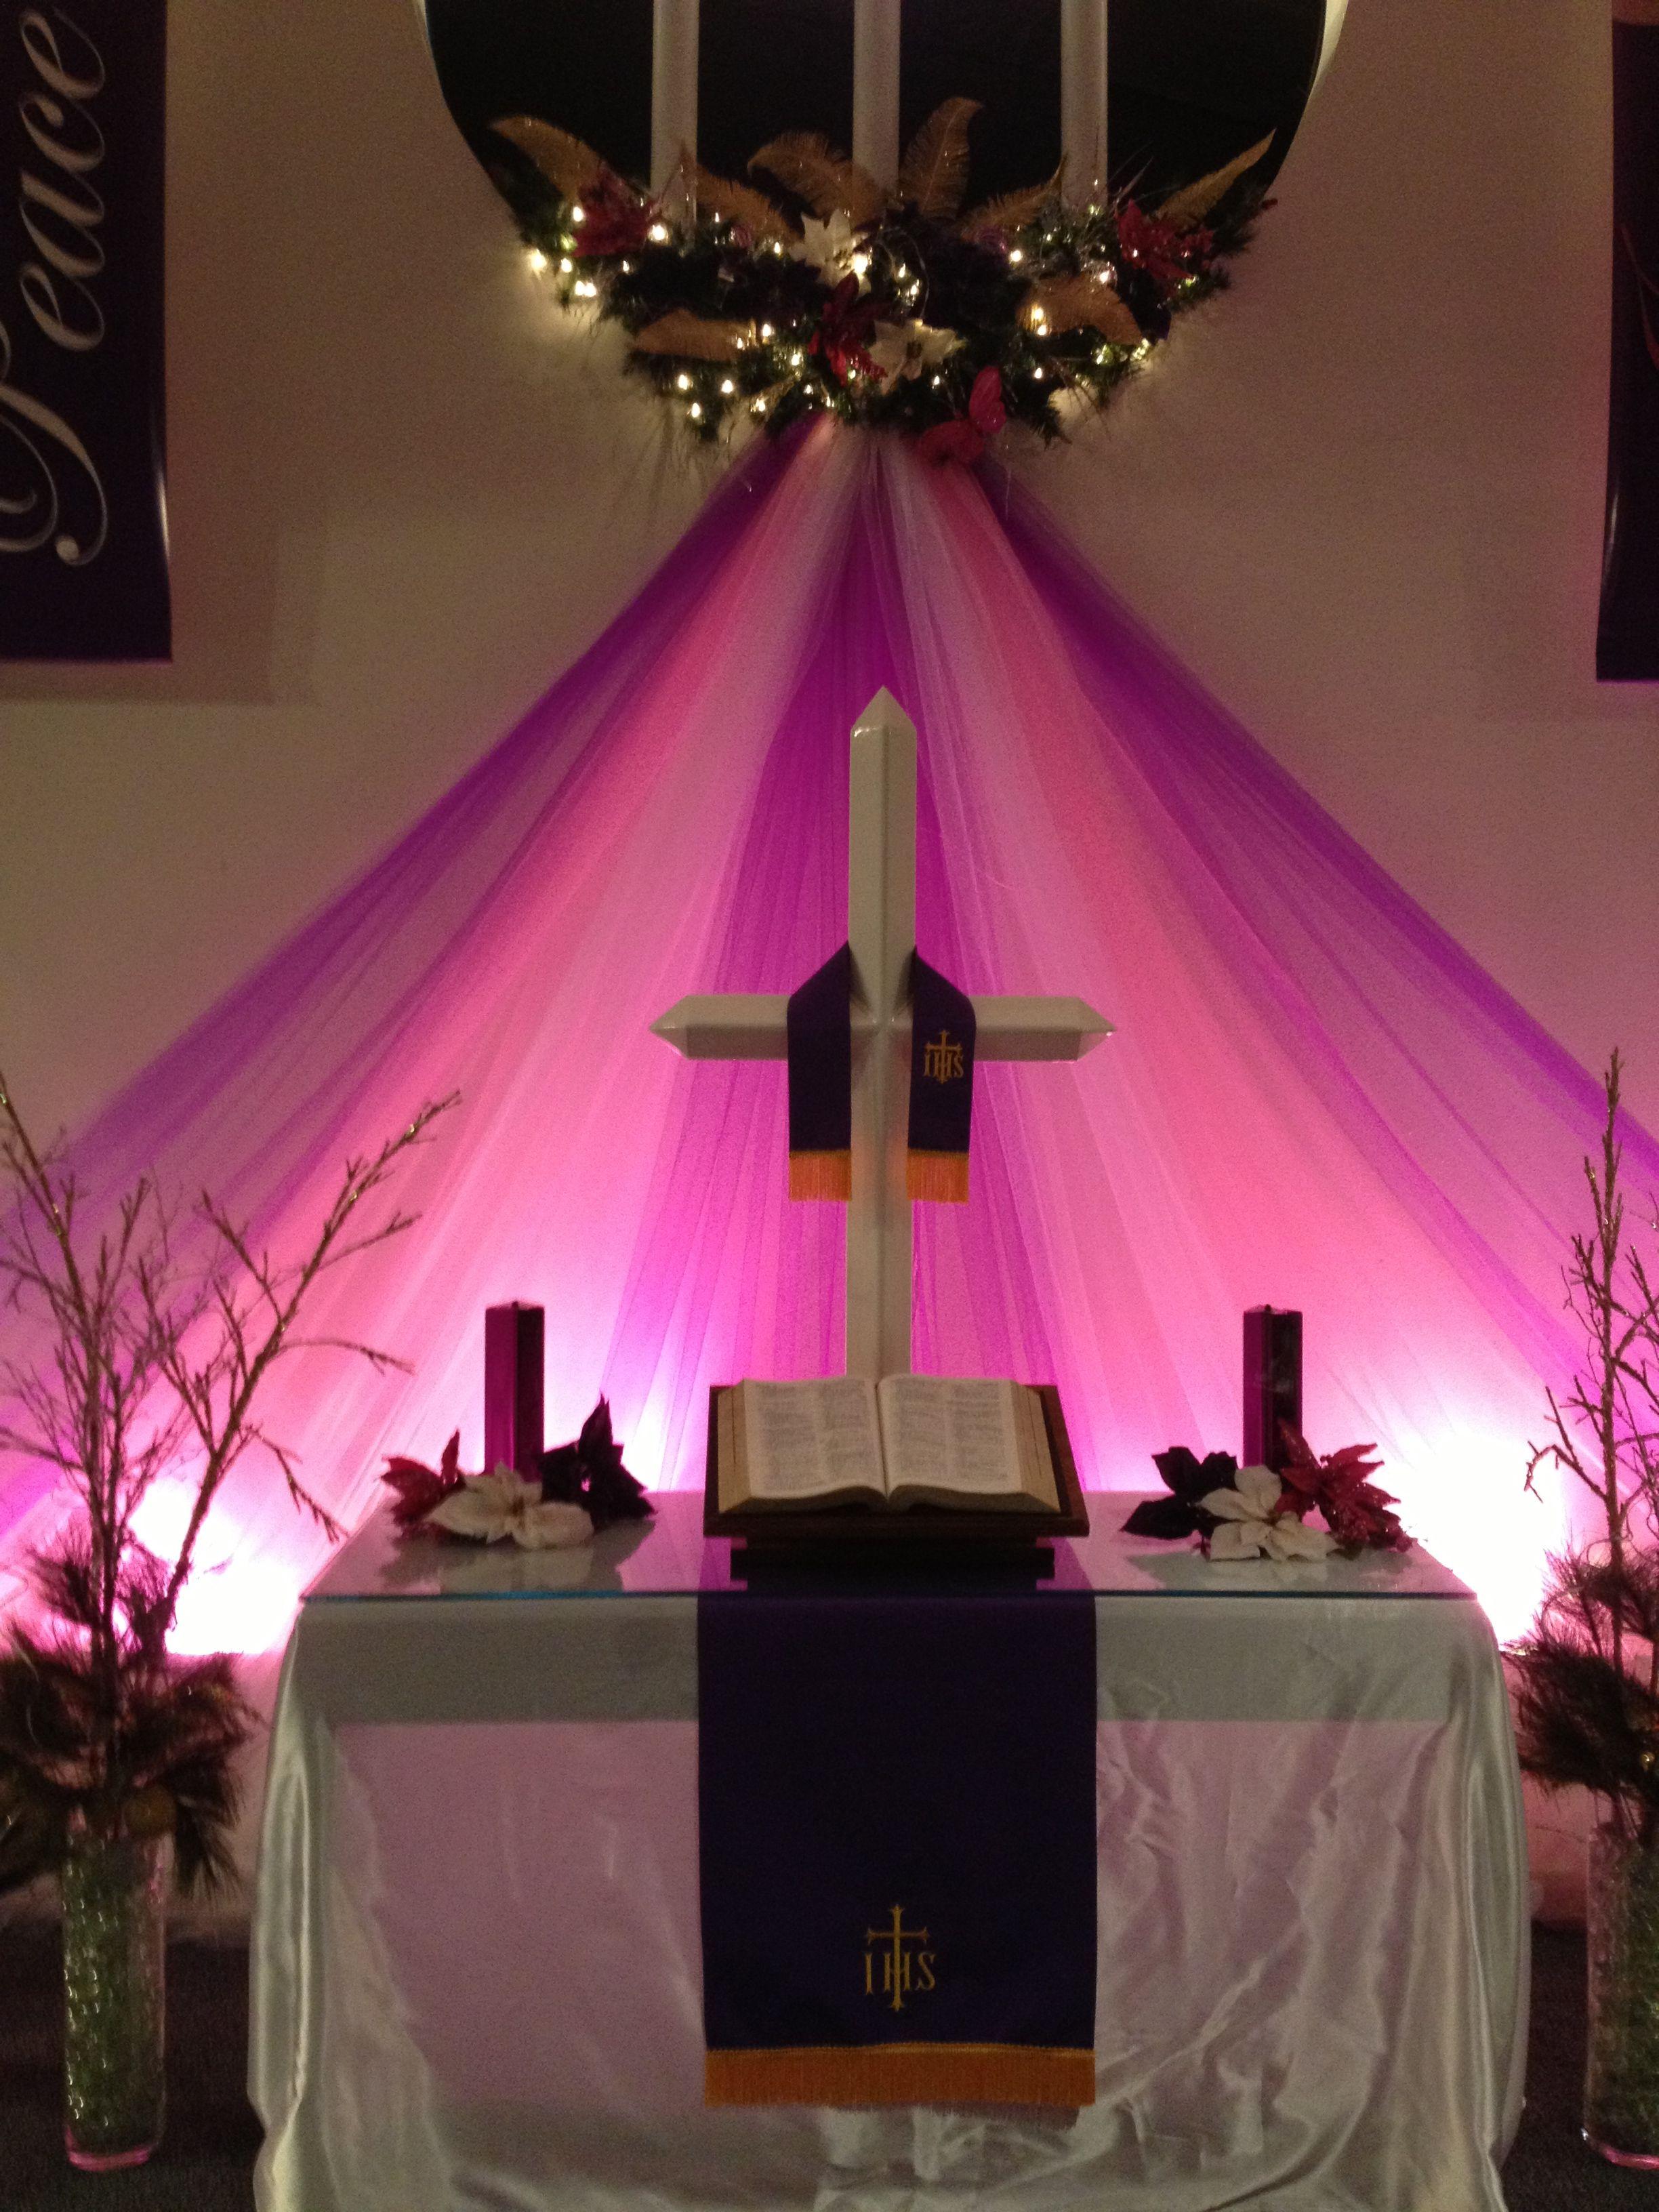 advent and christmas sanctuary decor church altar. Black Bedroom Furniture Sets. Home Design Ideas